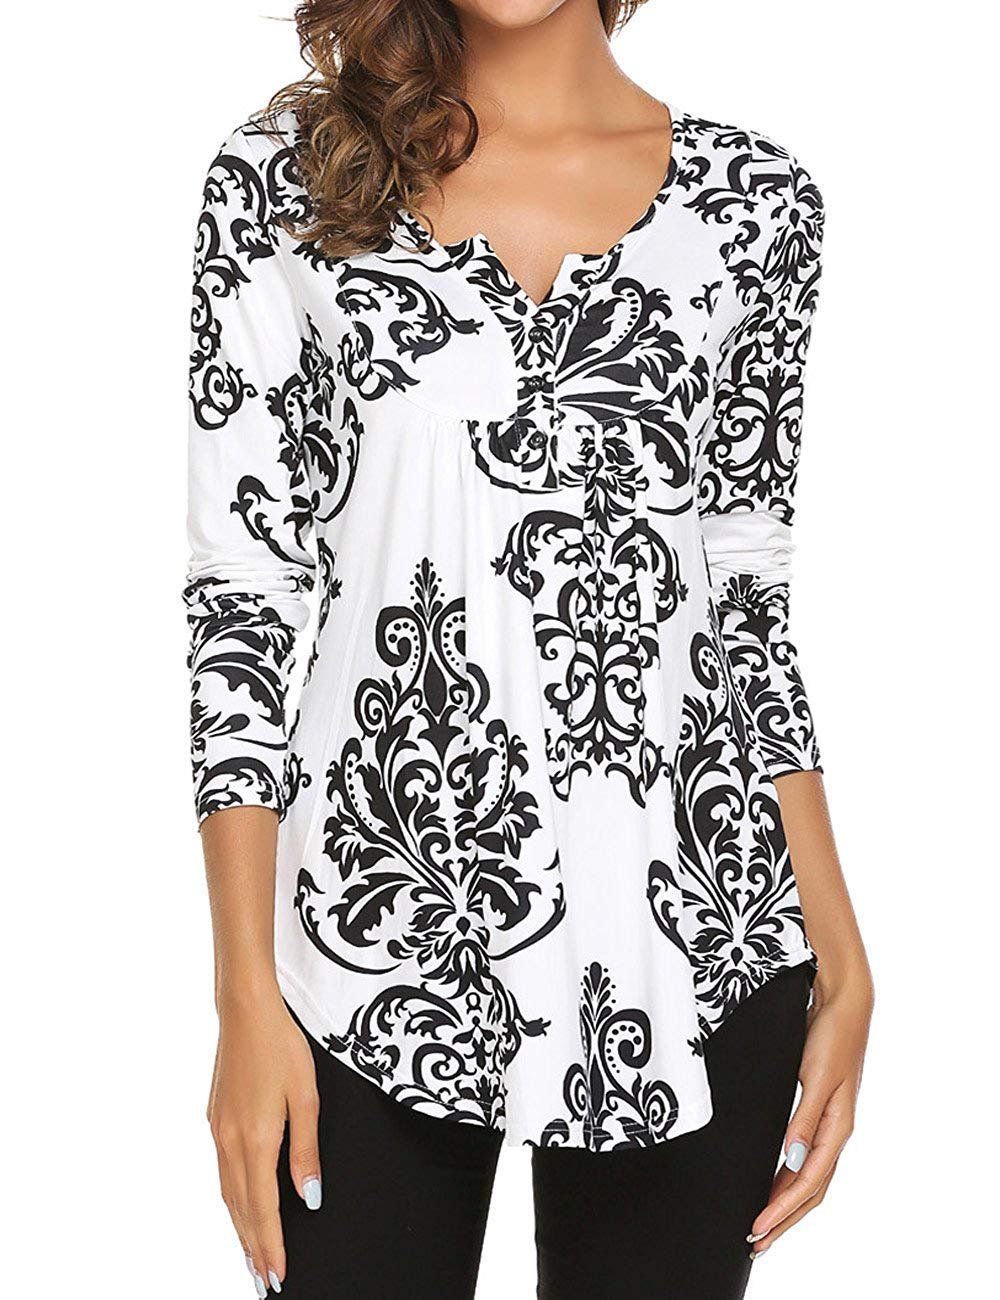 Euaoxnc Womens Long Sleeve Henley V Neck Blouse Button Decor Casual Loose Tunics Shirts Tops Plus Size XL Black